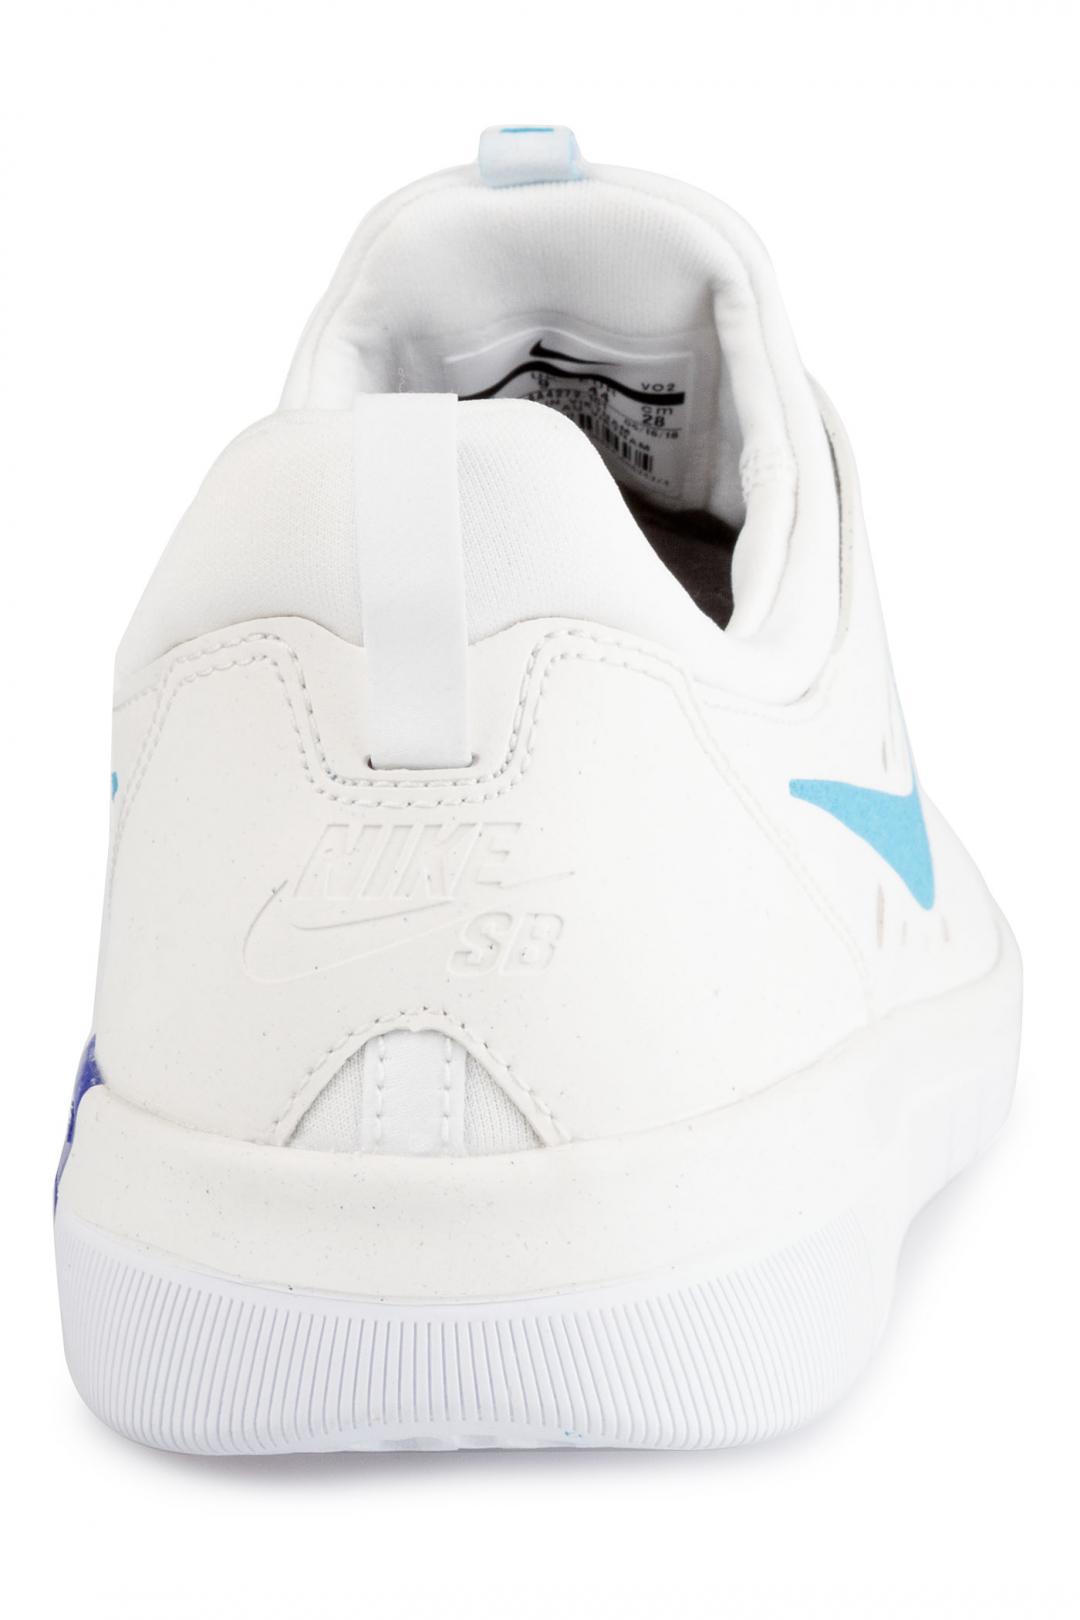 Uomo Nike SB Nyjah Free summit white light blue | Scarpe da skate